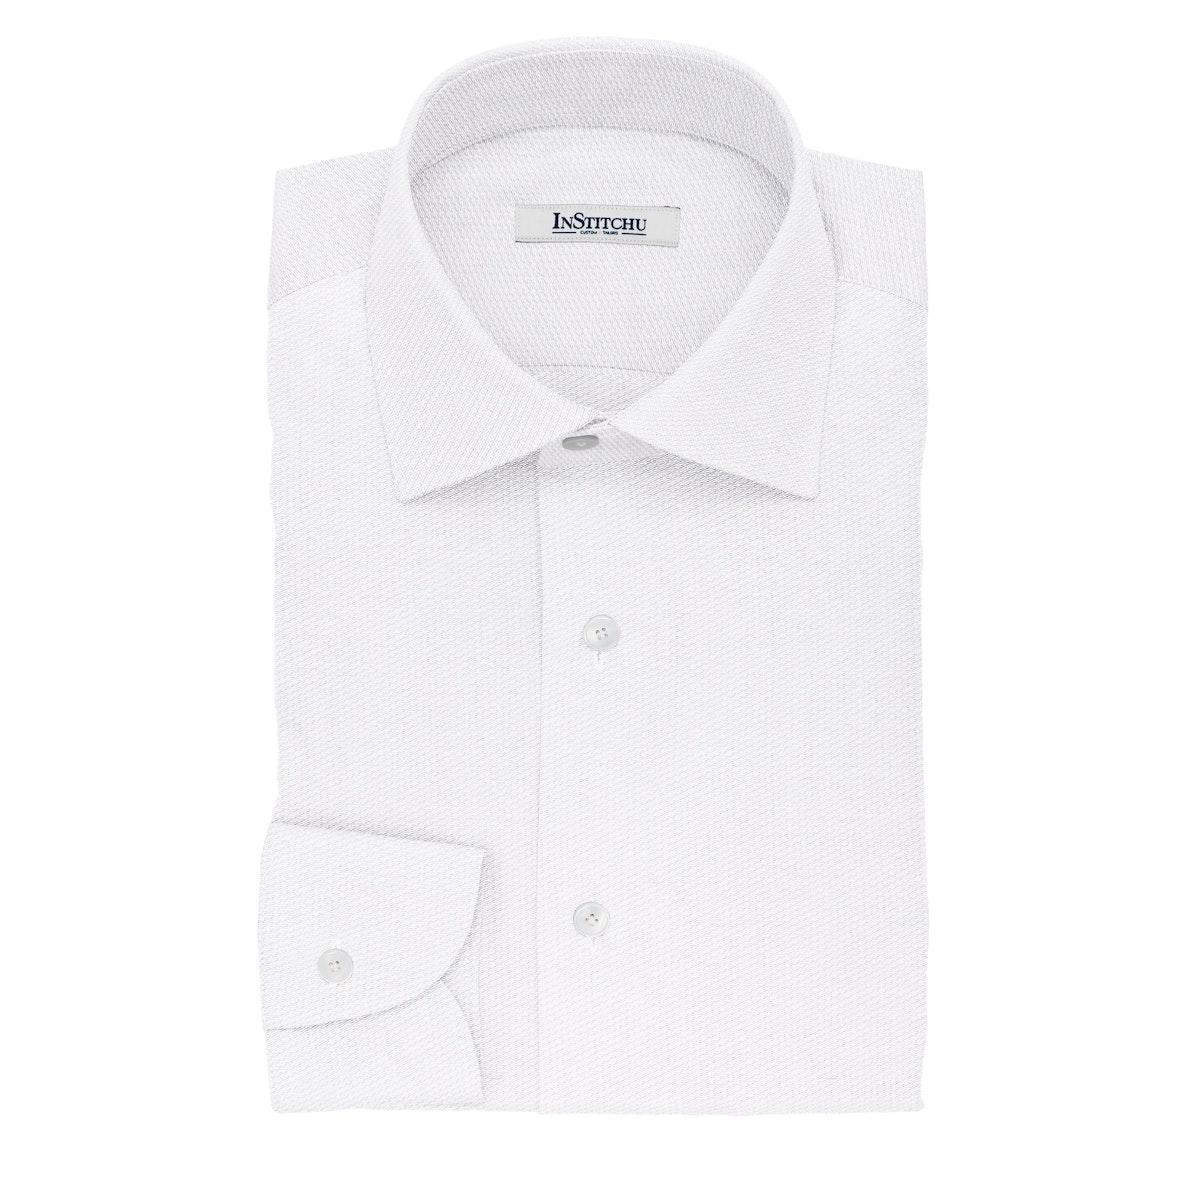 InStitchu Collection The Hunt White Diamond Cotton Shirt